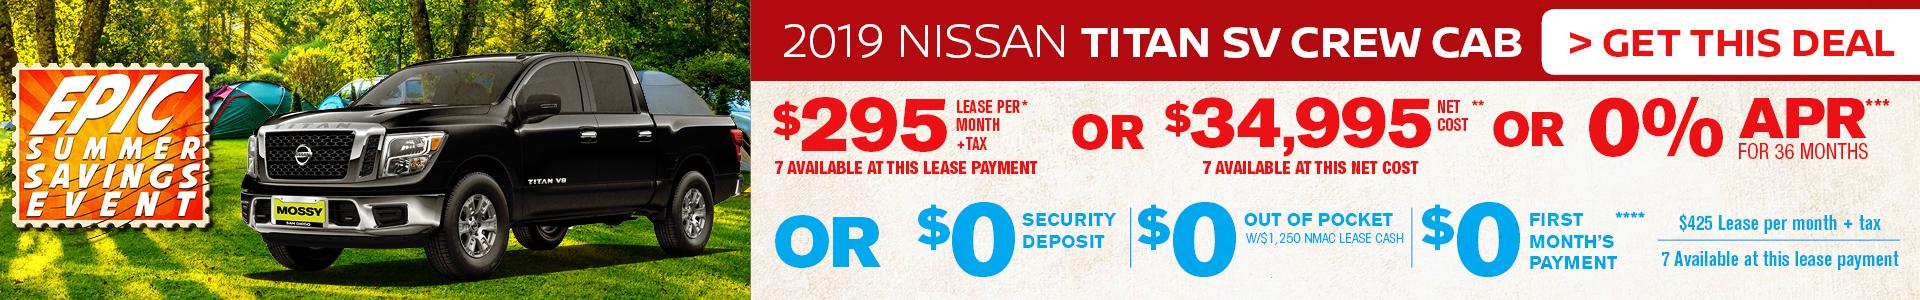 Mossy Nissan - Nissan Titan $295 Lease